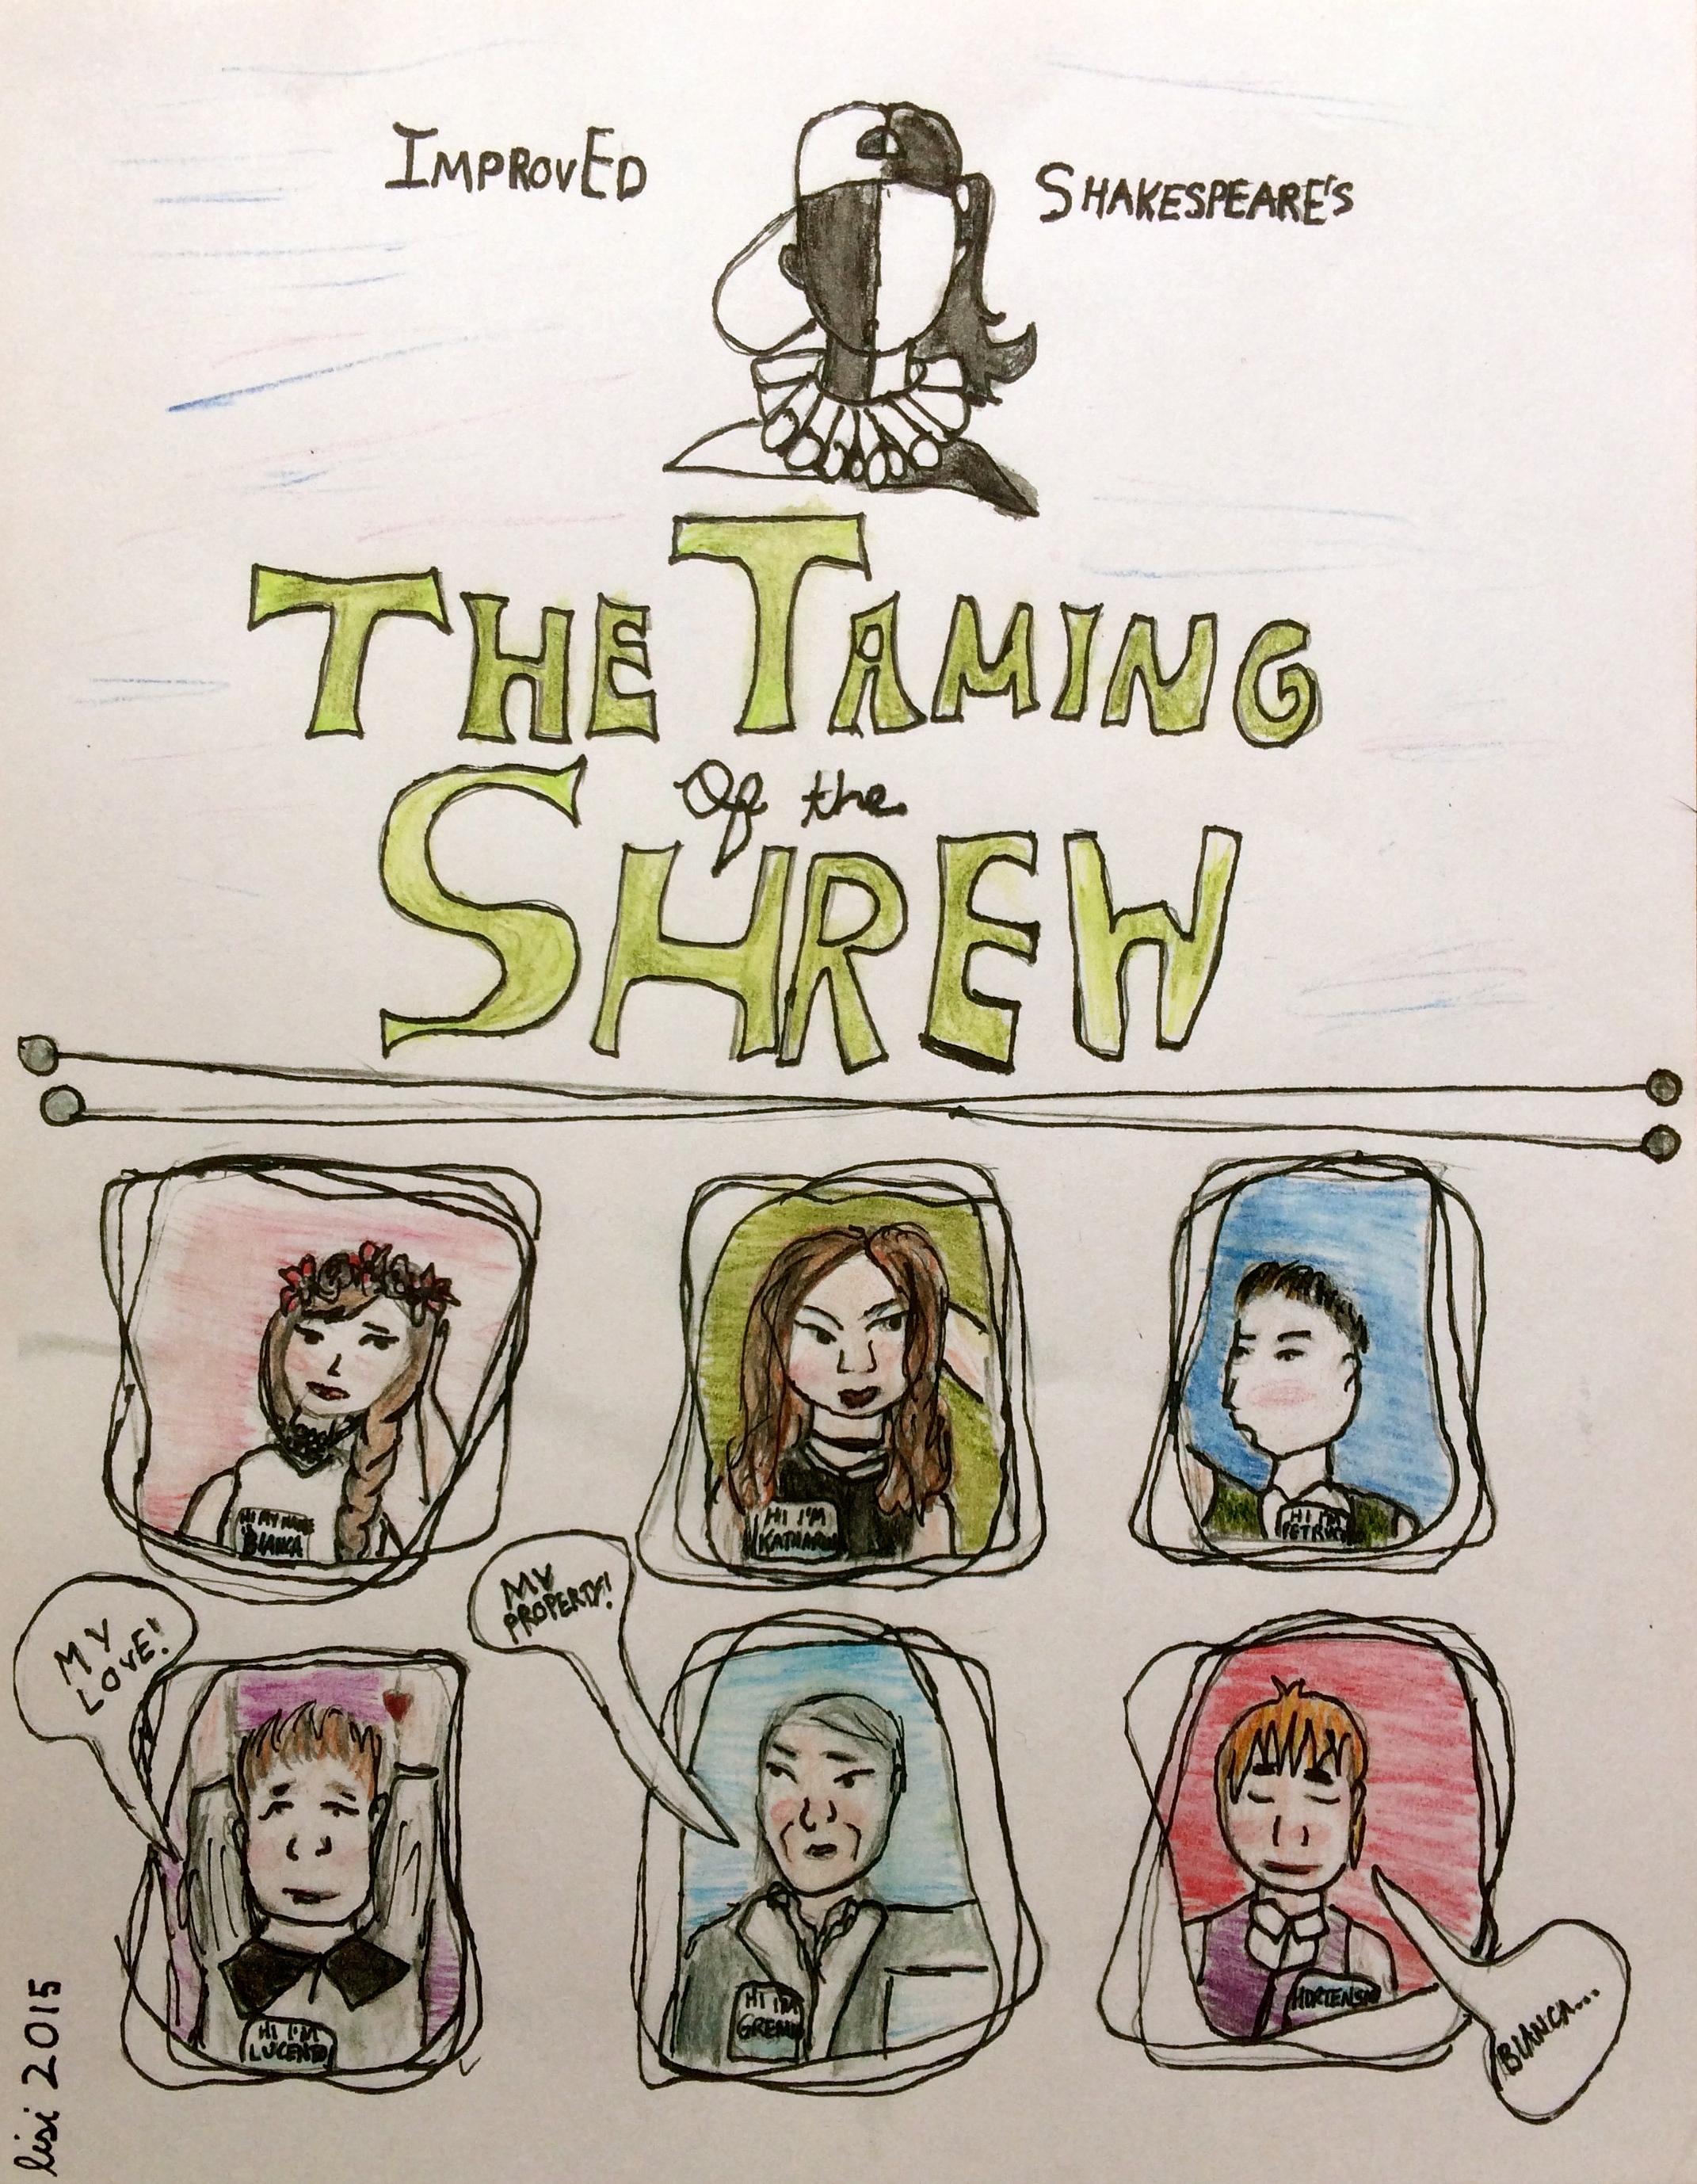 Taming Of The Shrew Spoilers